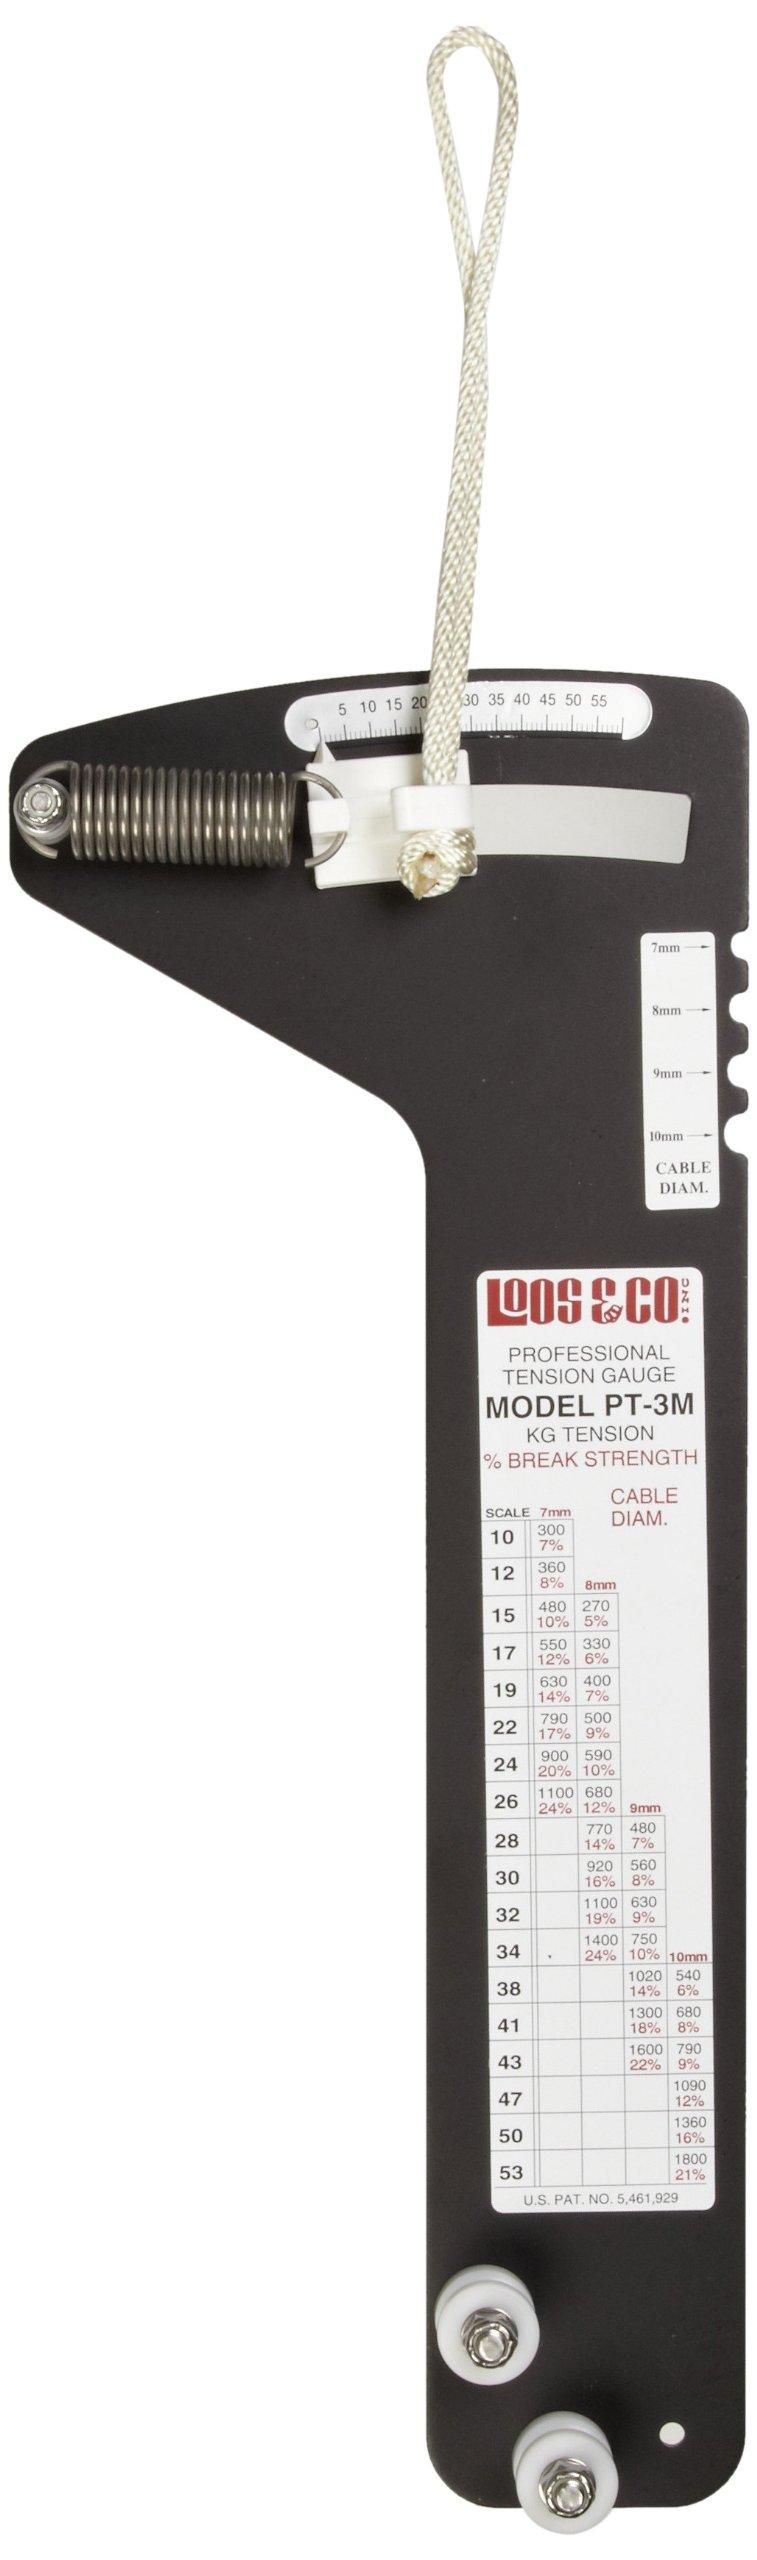 Cheap Cable Diameter Gauge, find Cable Diameter Gauge deals on line ...